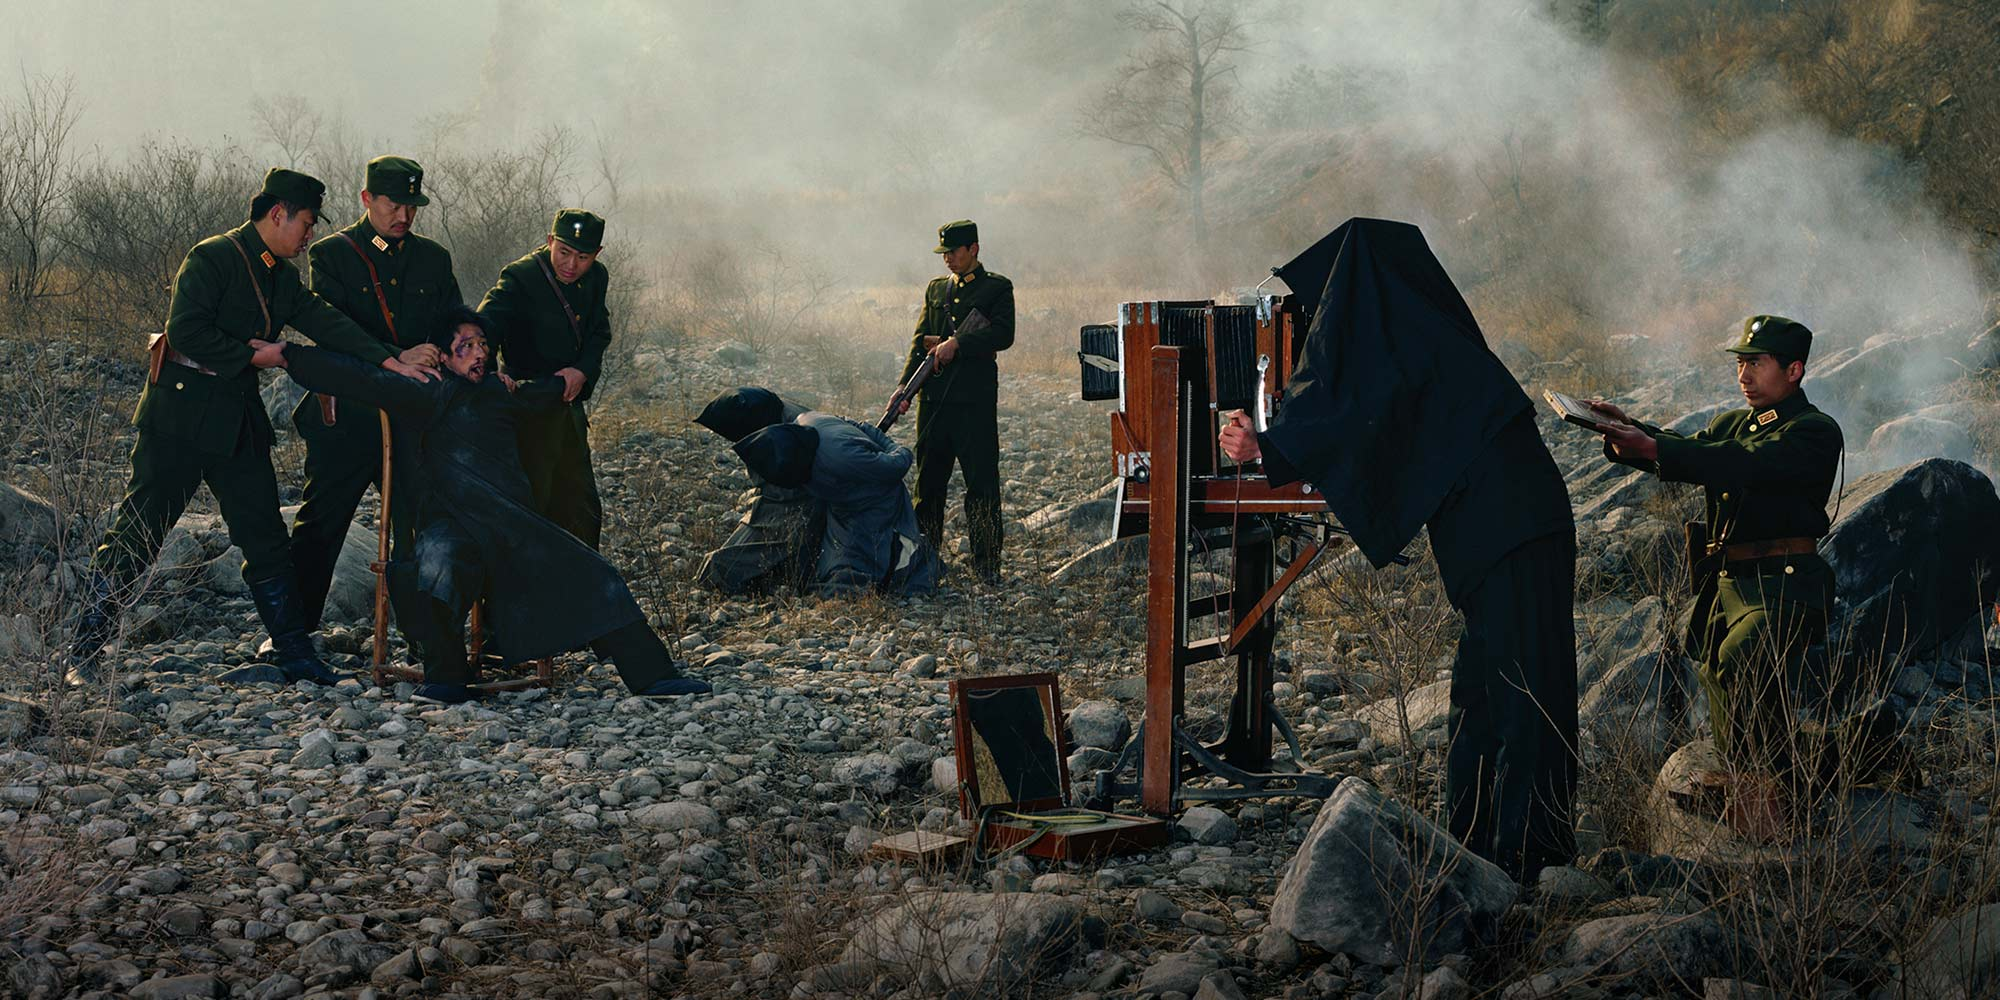 Ready, Aim, Click: The Artist Reframing China's Modern History